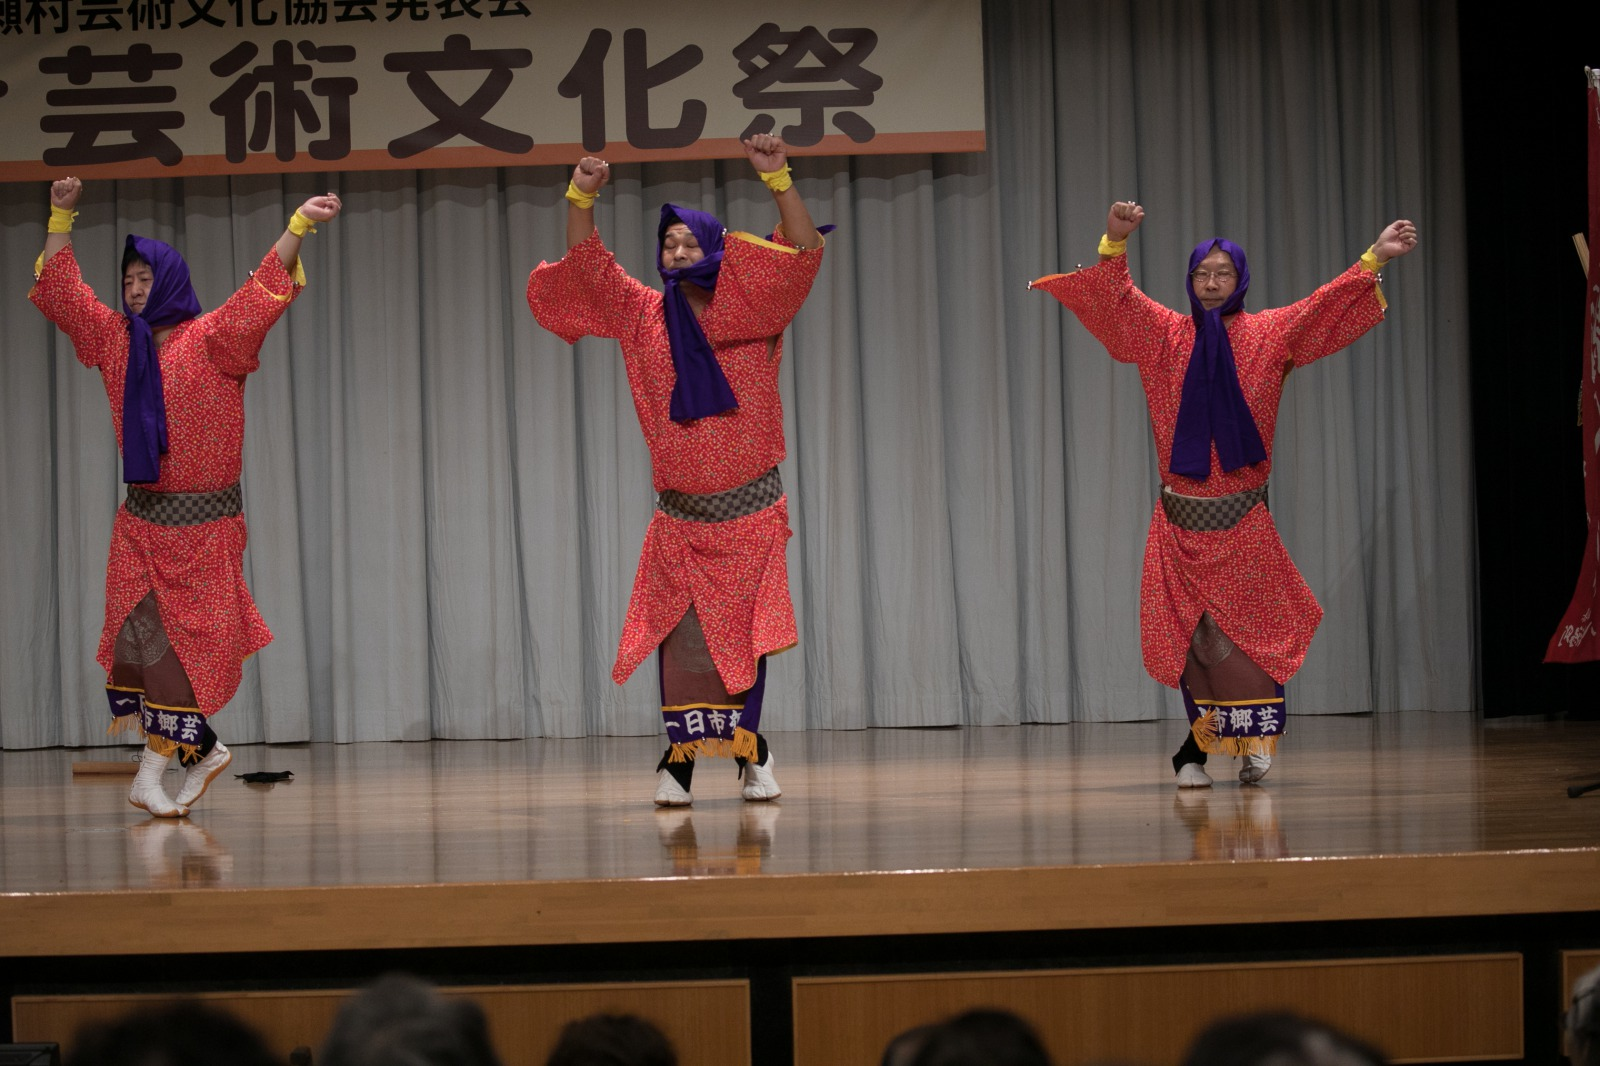 R020216_芸術文化祭_1_ステージ発表135